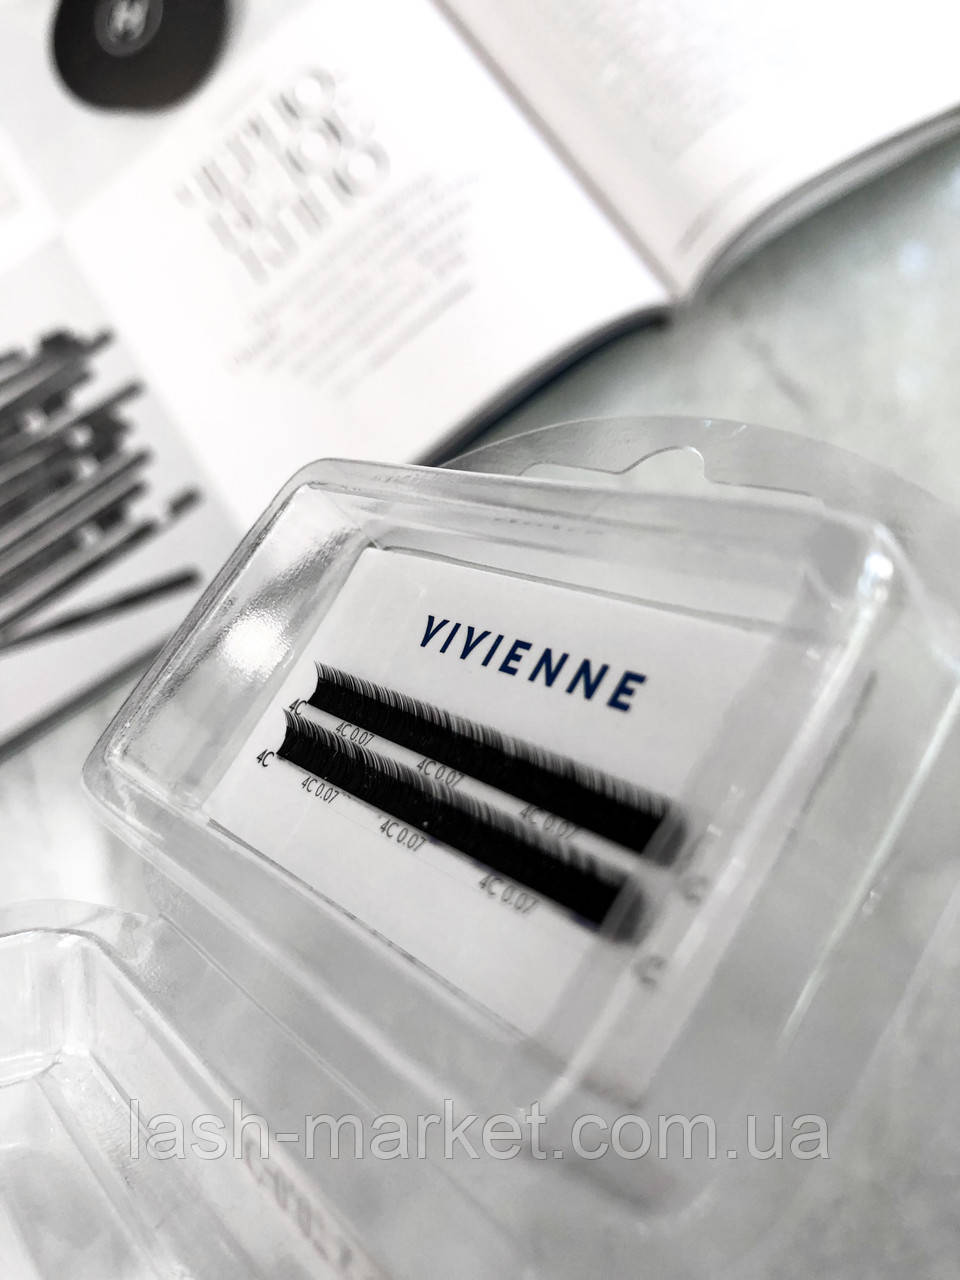 Ресницы 2 ленты С 0.07(4мм) Vivienne elite чёрные